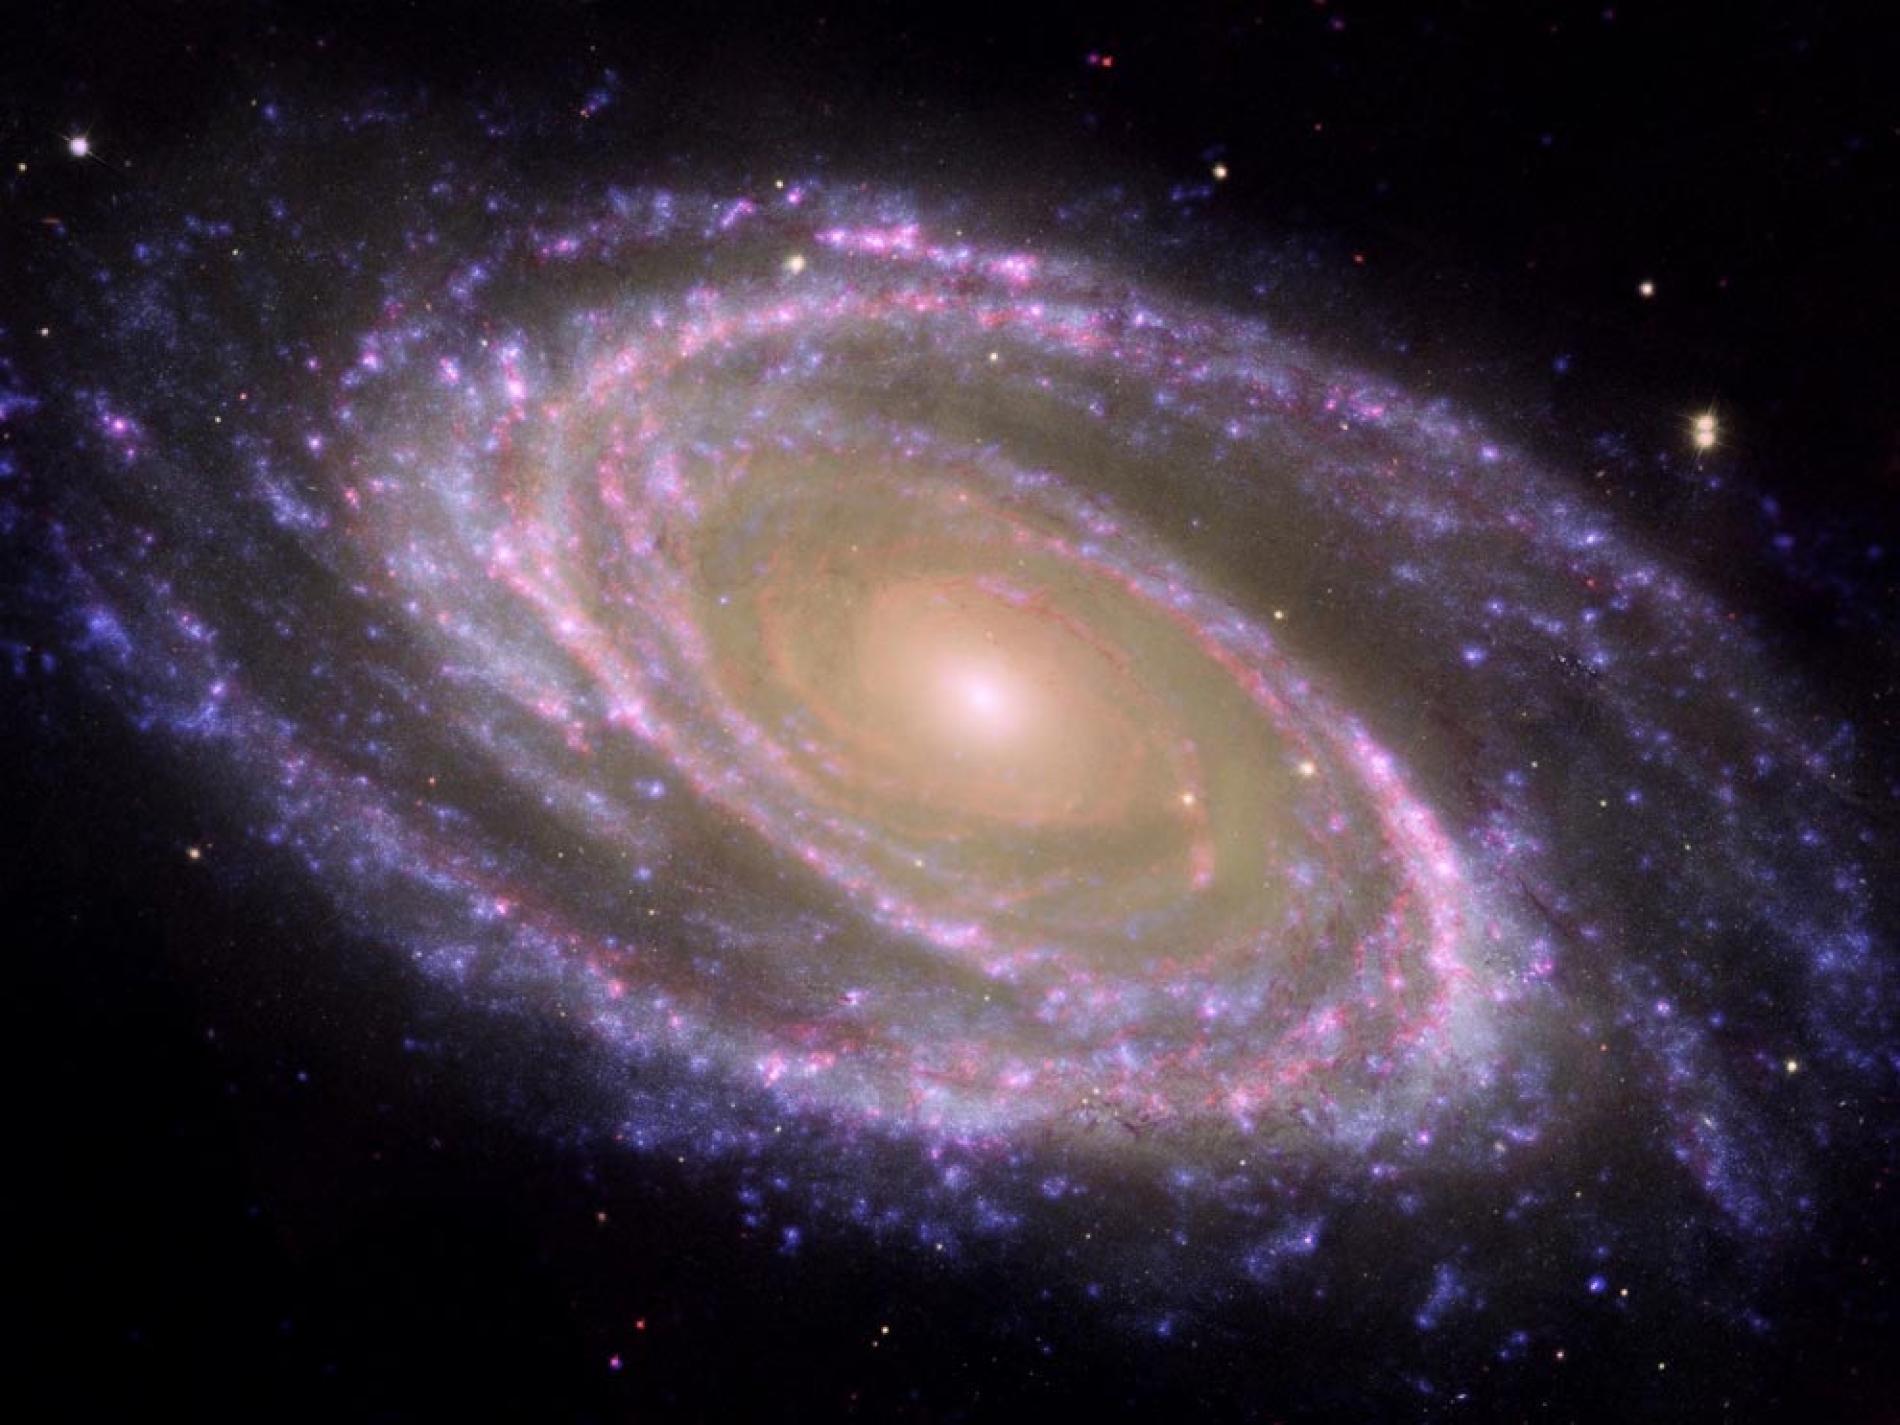 Galaxiaphobia